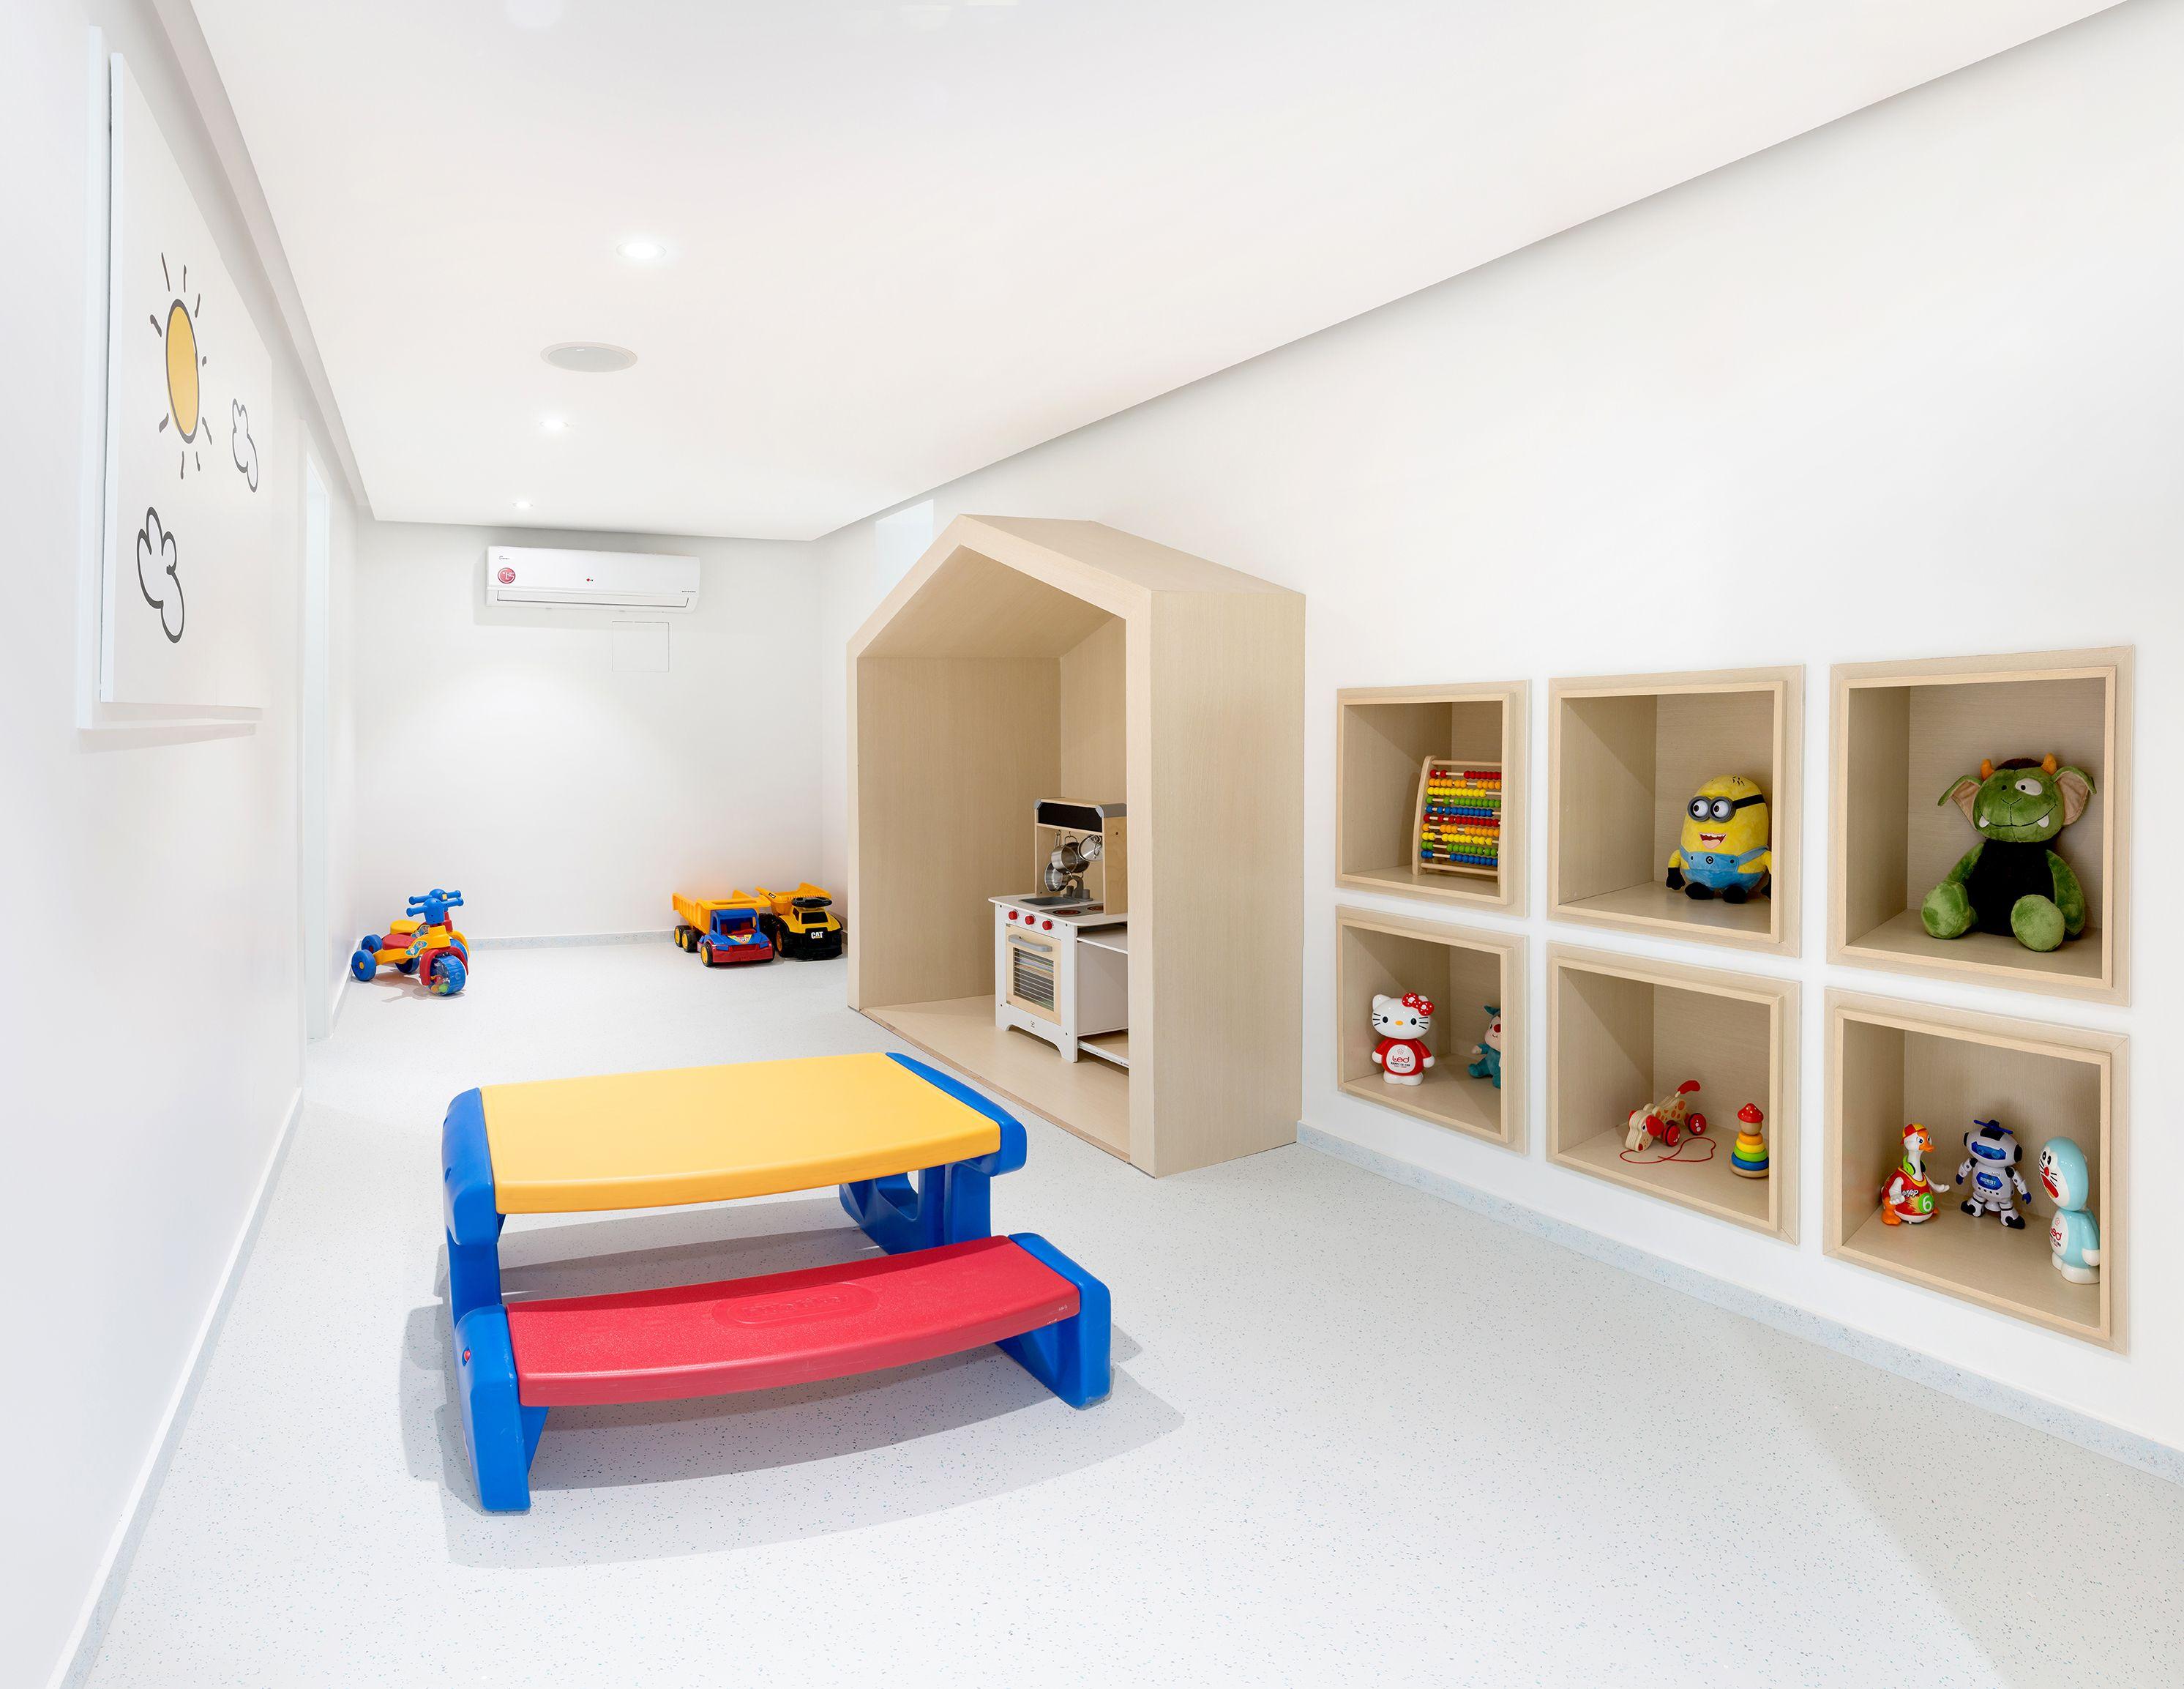 Children\'s Hospital, MRI, Hospital Interior Design, Imaging System ...